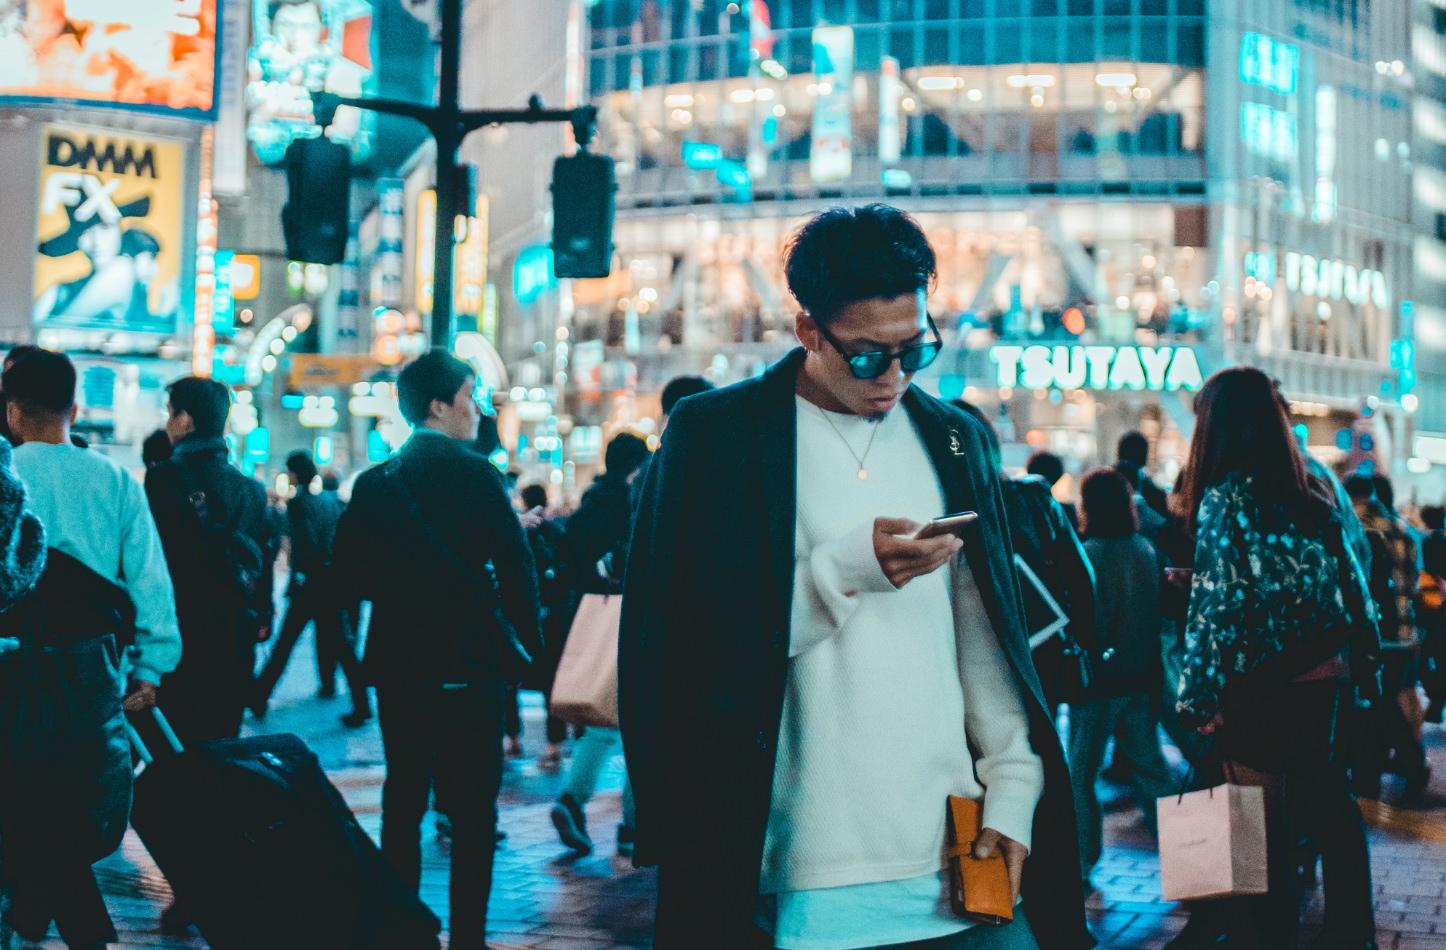 Using iPhone in Shibuya